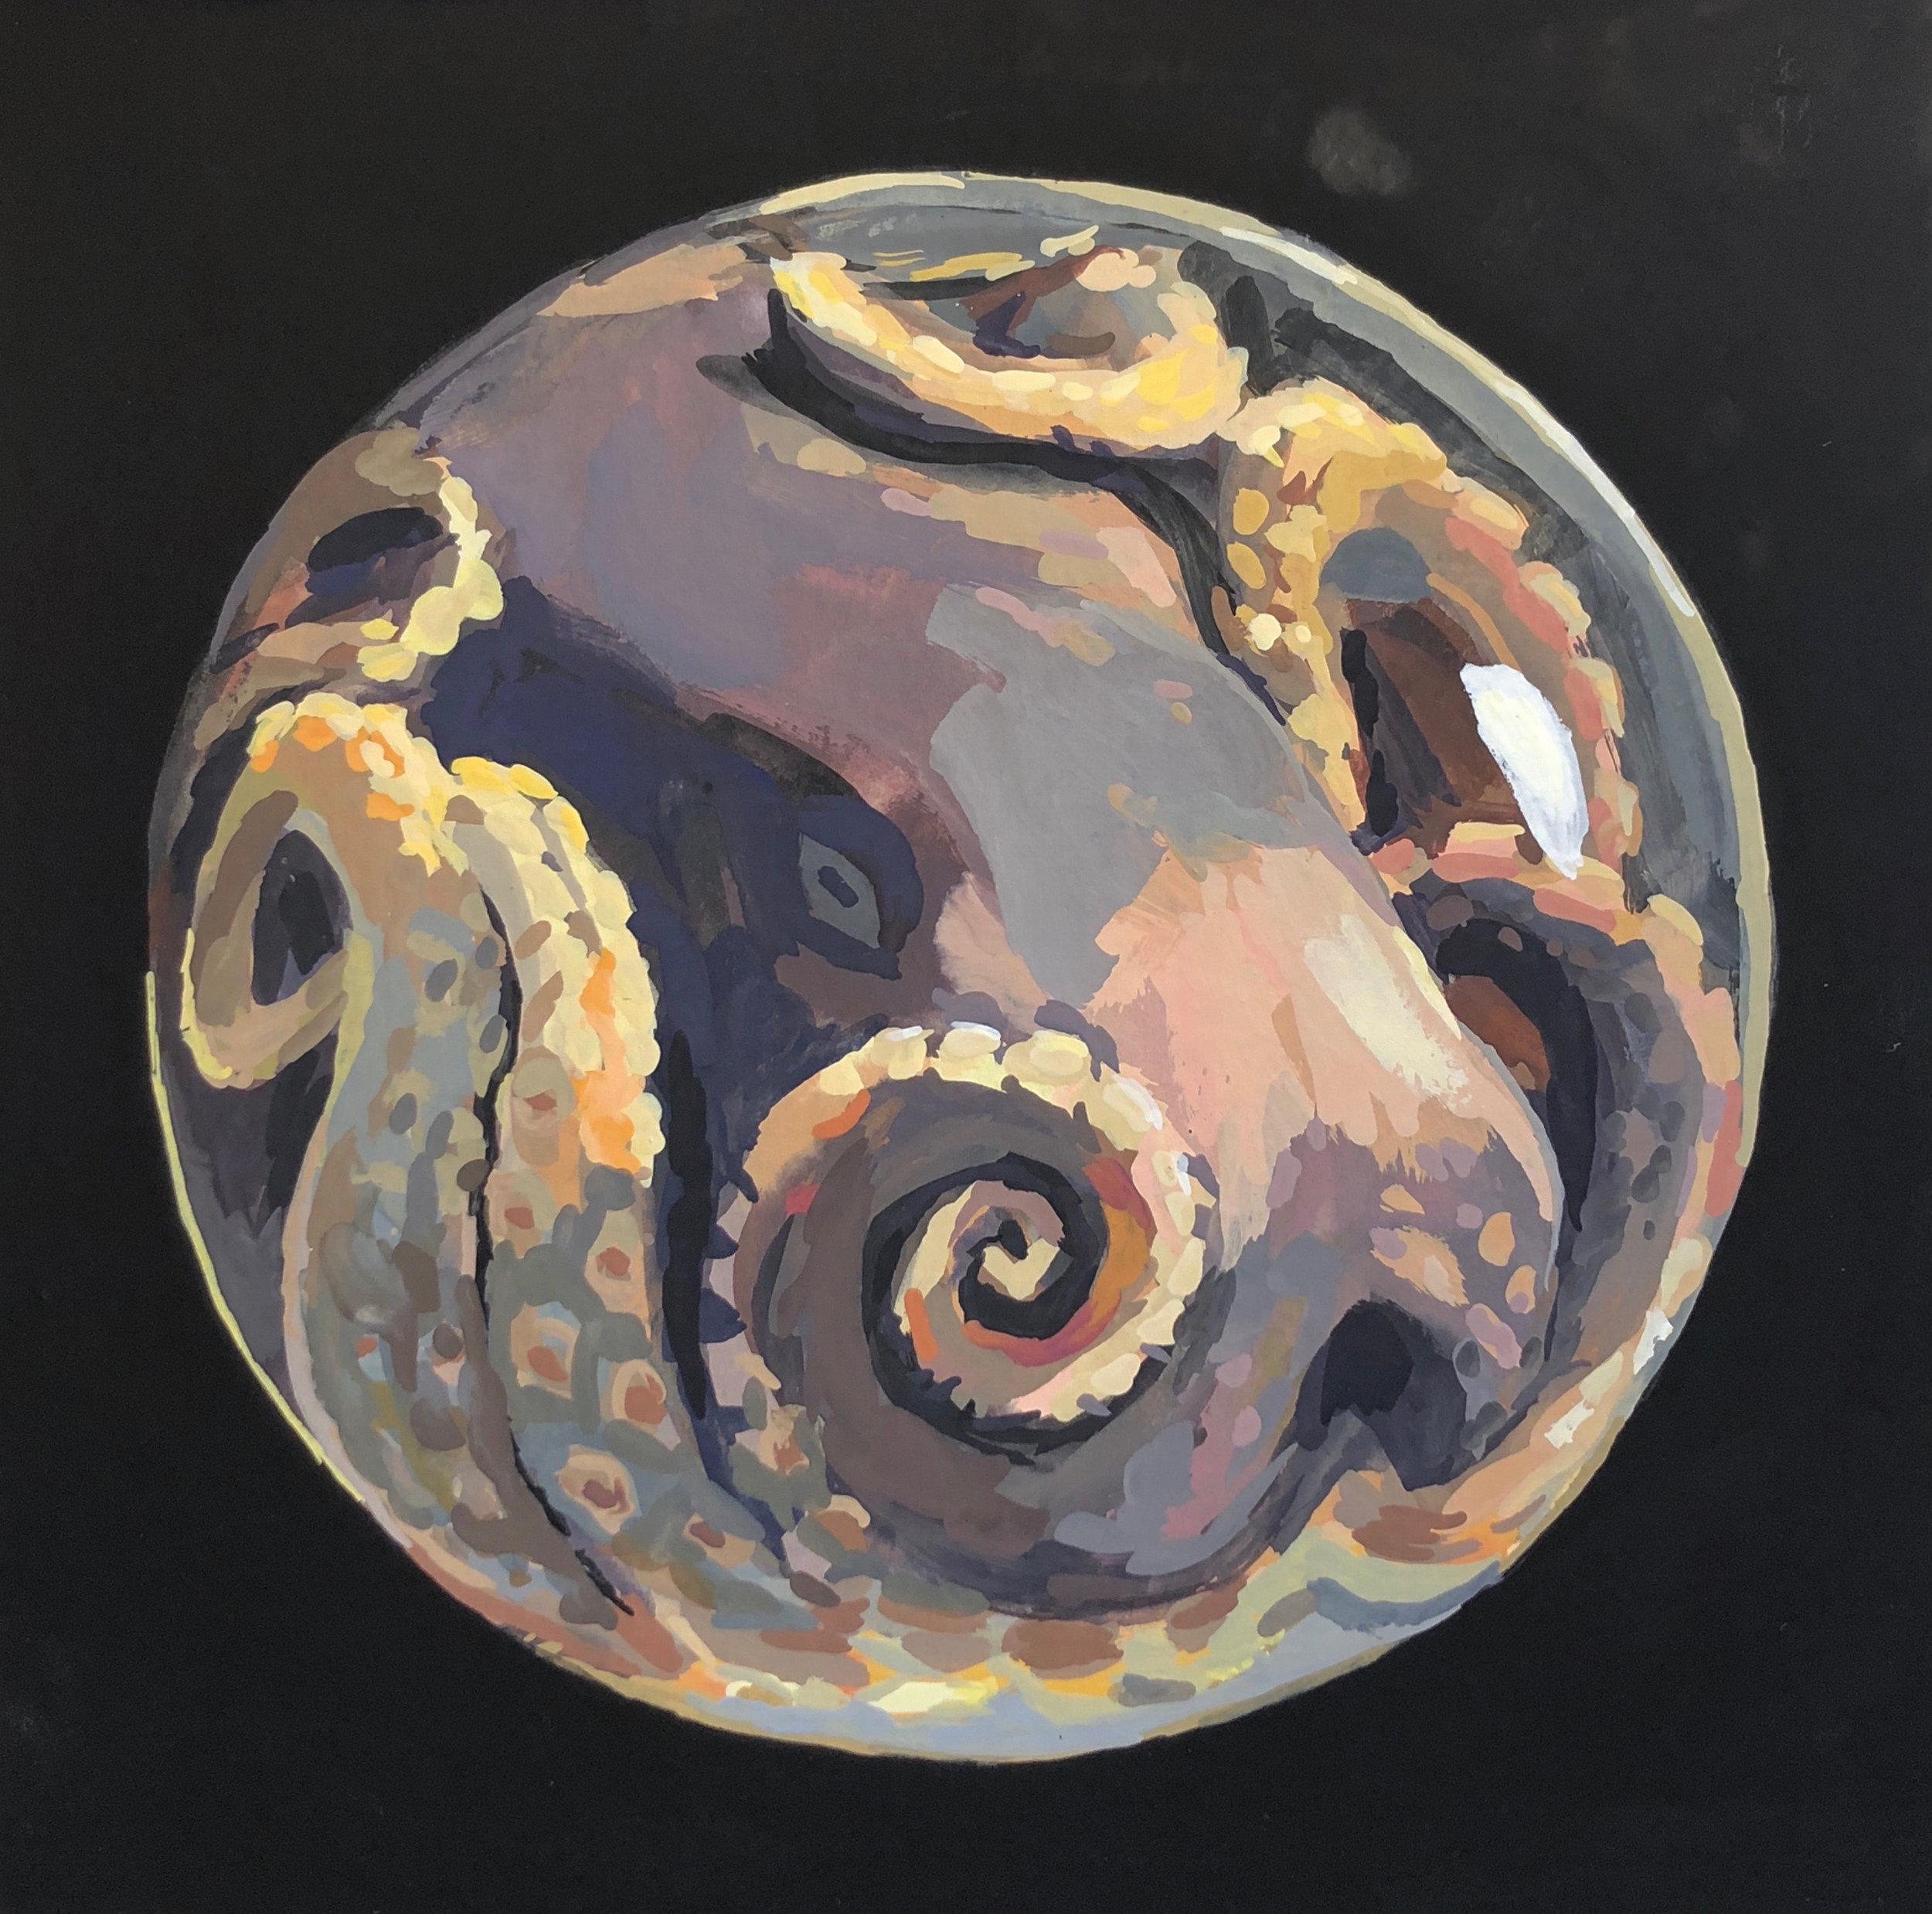 Octopus Orb